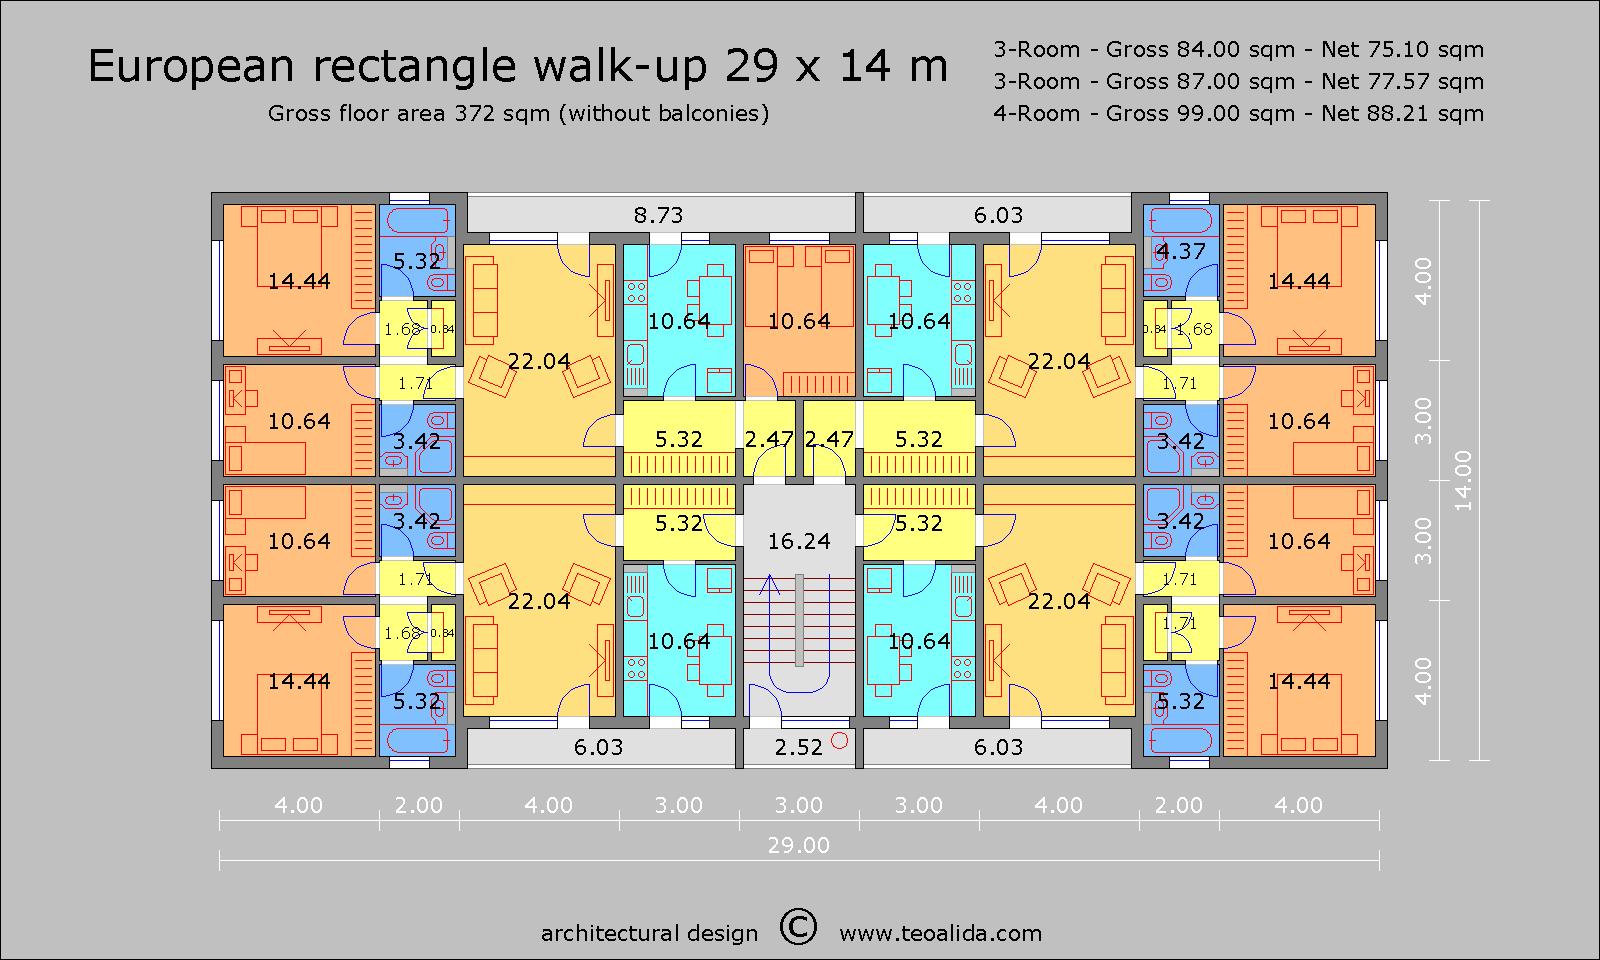 European Rectangle 29 x 14 m